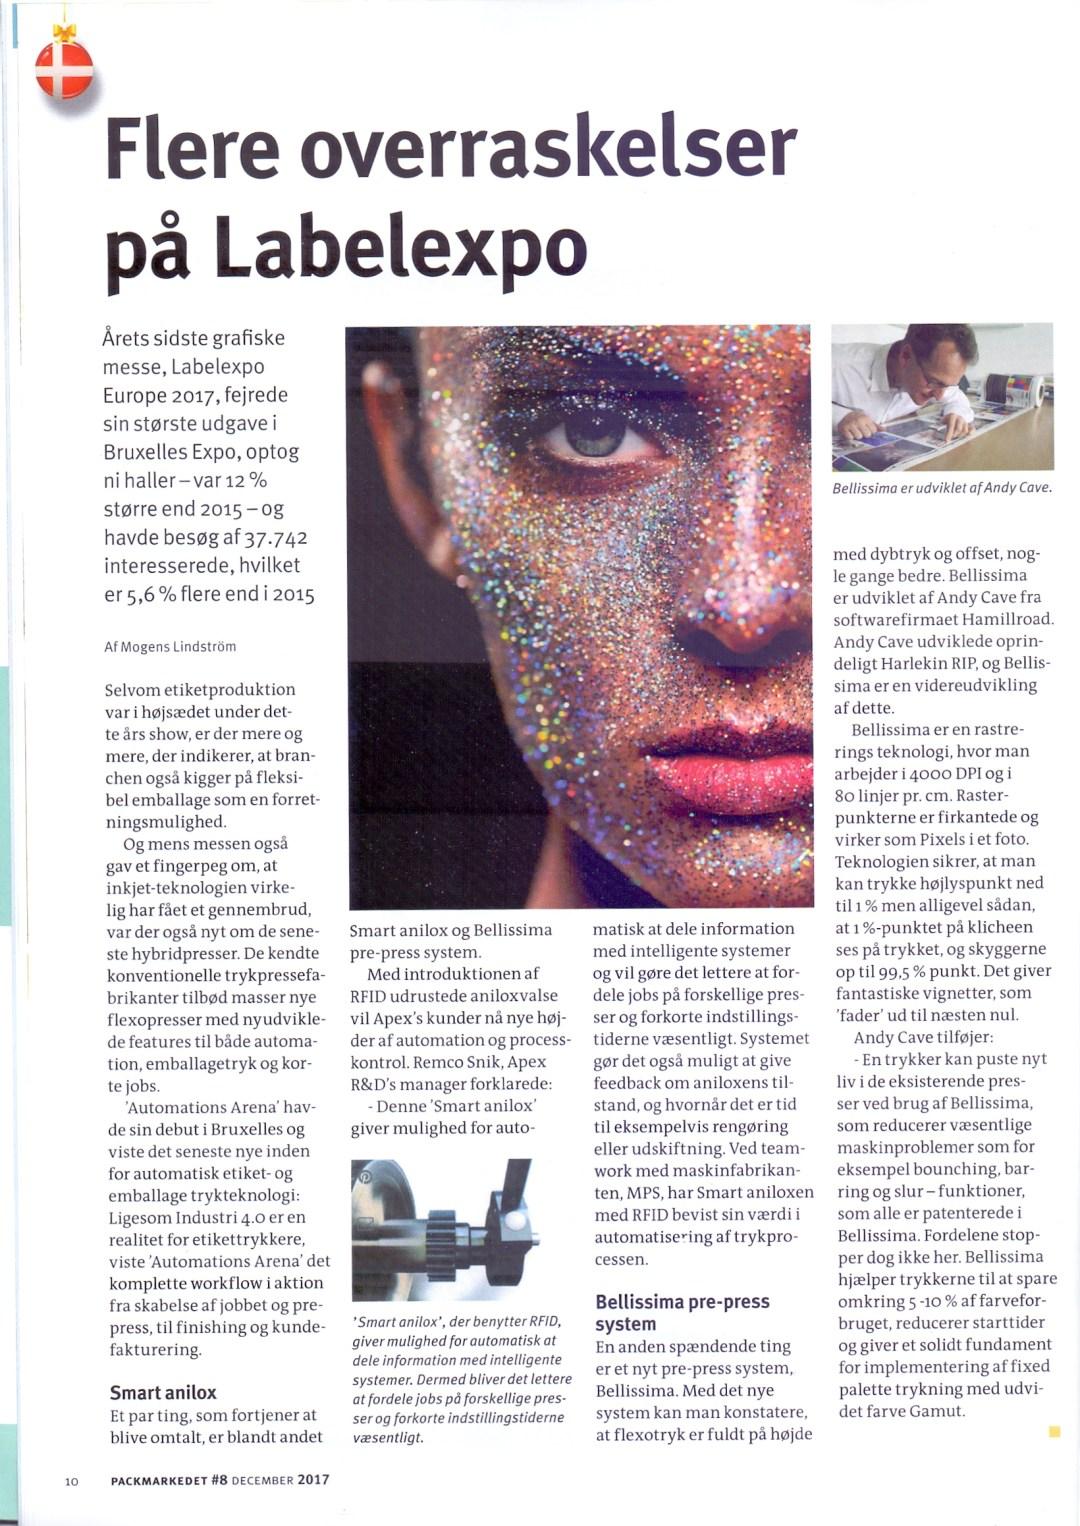 Flere overraskelser på Labelexpo   More surprises at Labelexpo - Bellissima Digitally Modulated Screening